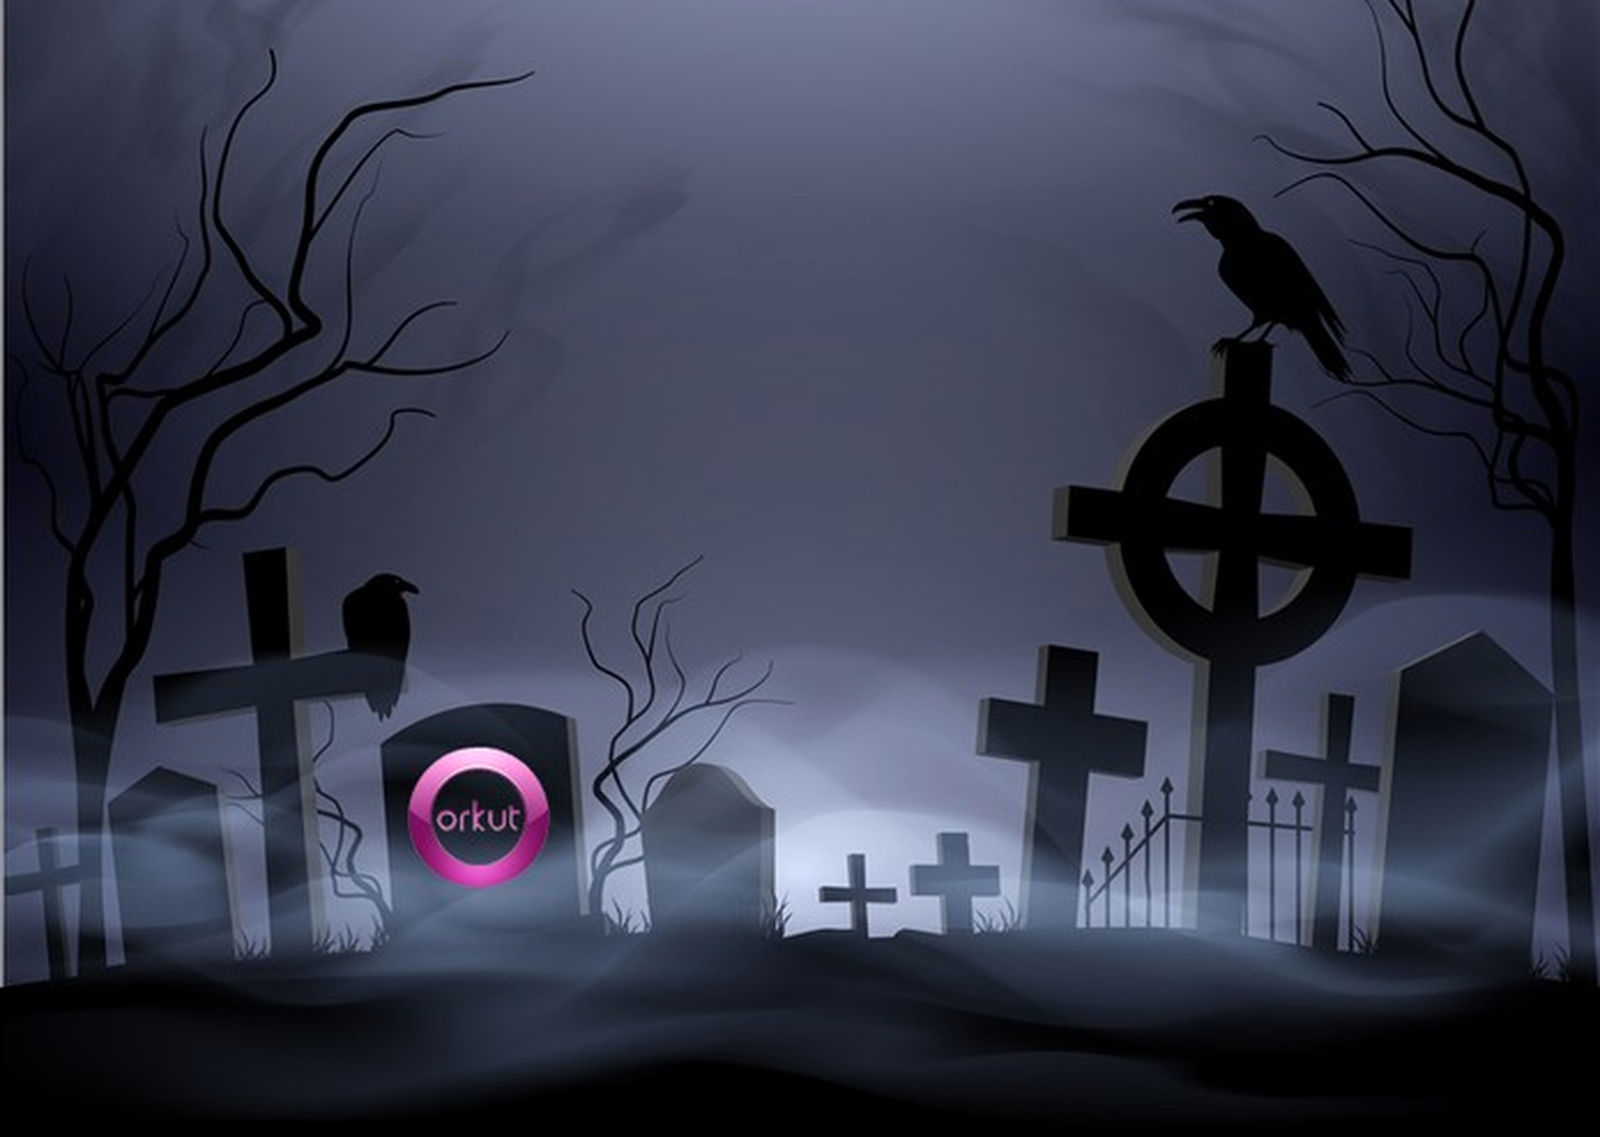 Baixar fotos do orkut 65